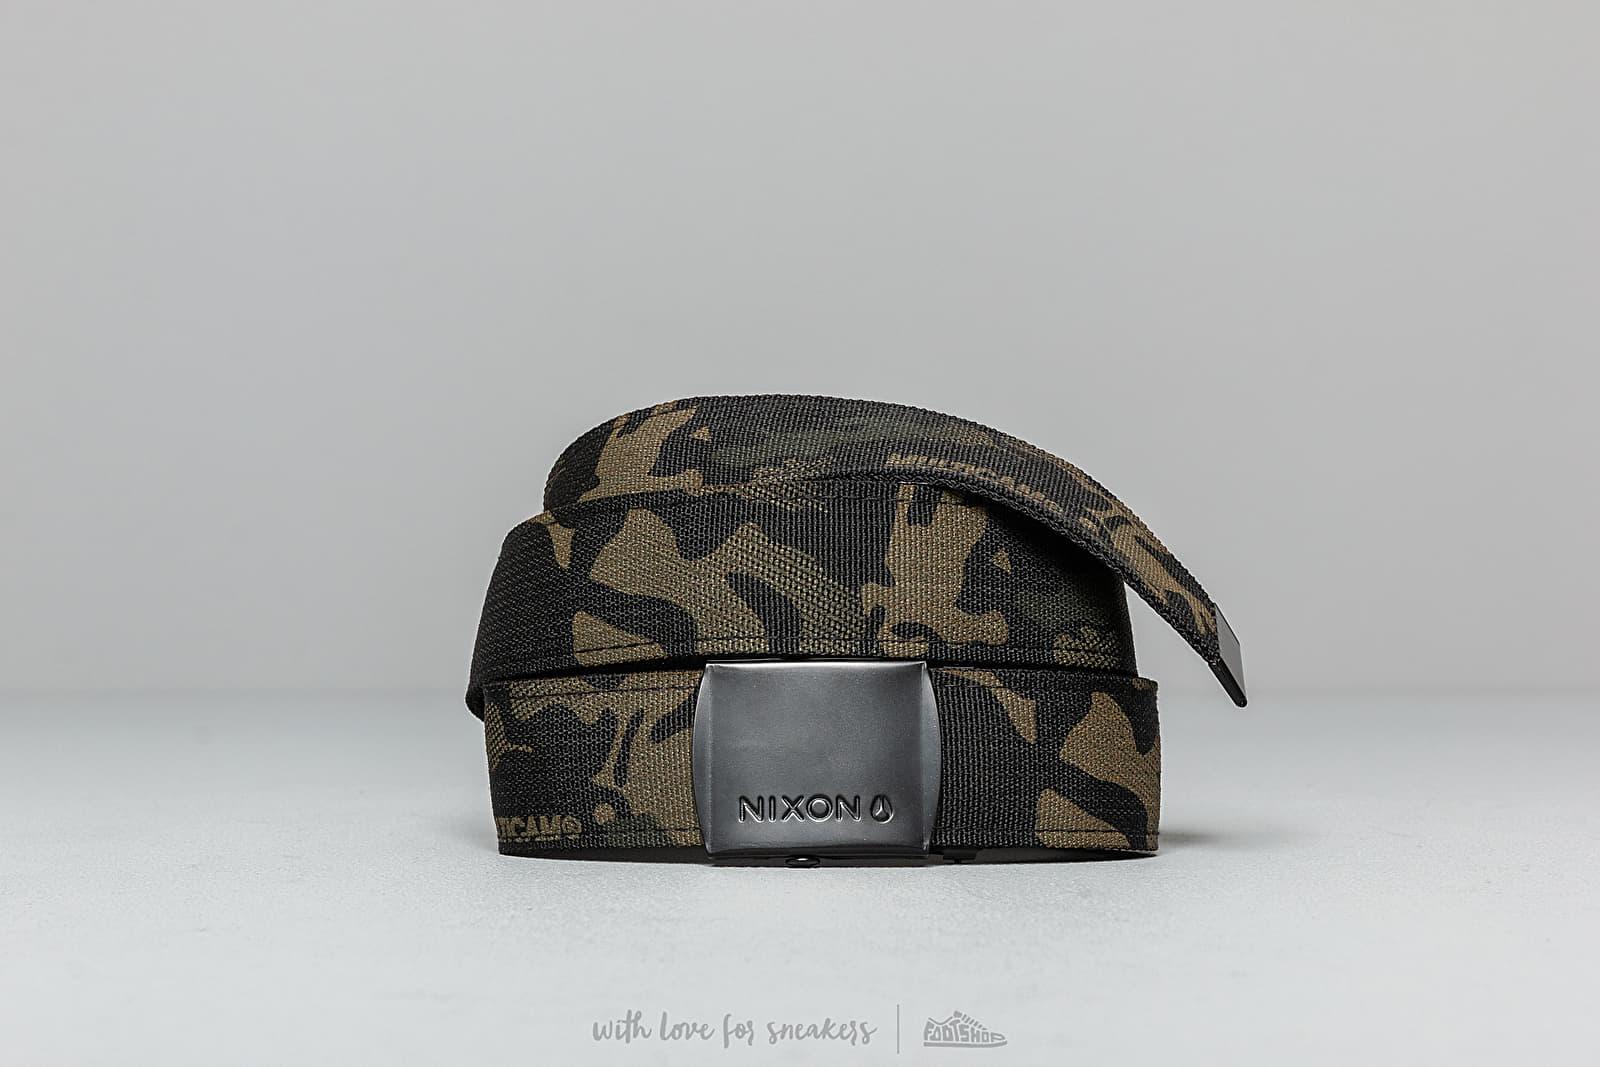 NIxon Basic Belt Multi Camo za skvelú cenu 18 € kúpite na Footshop.sk